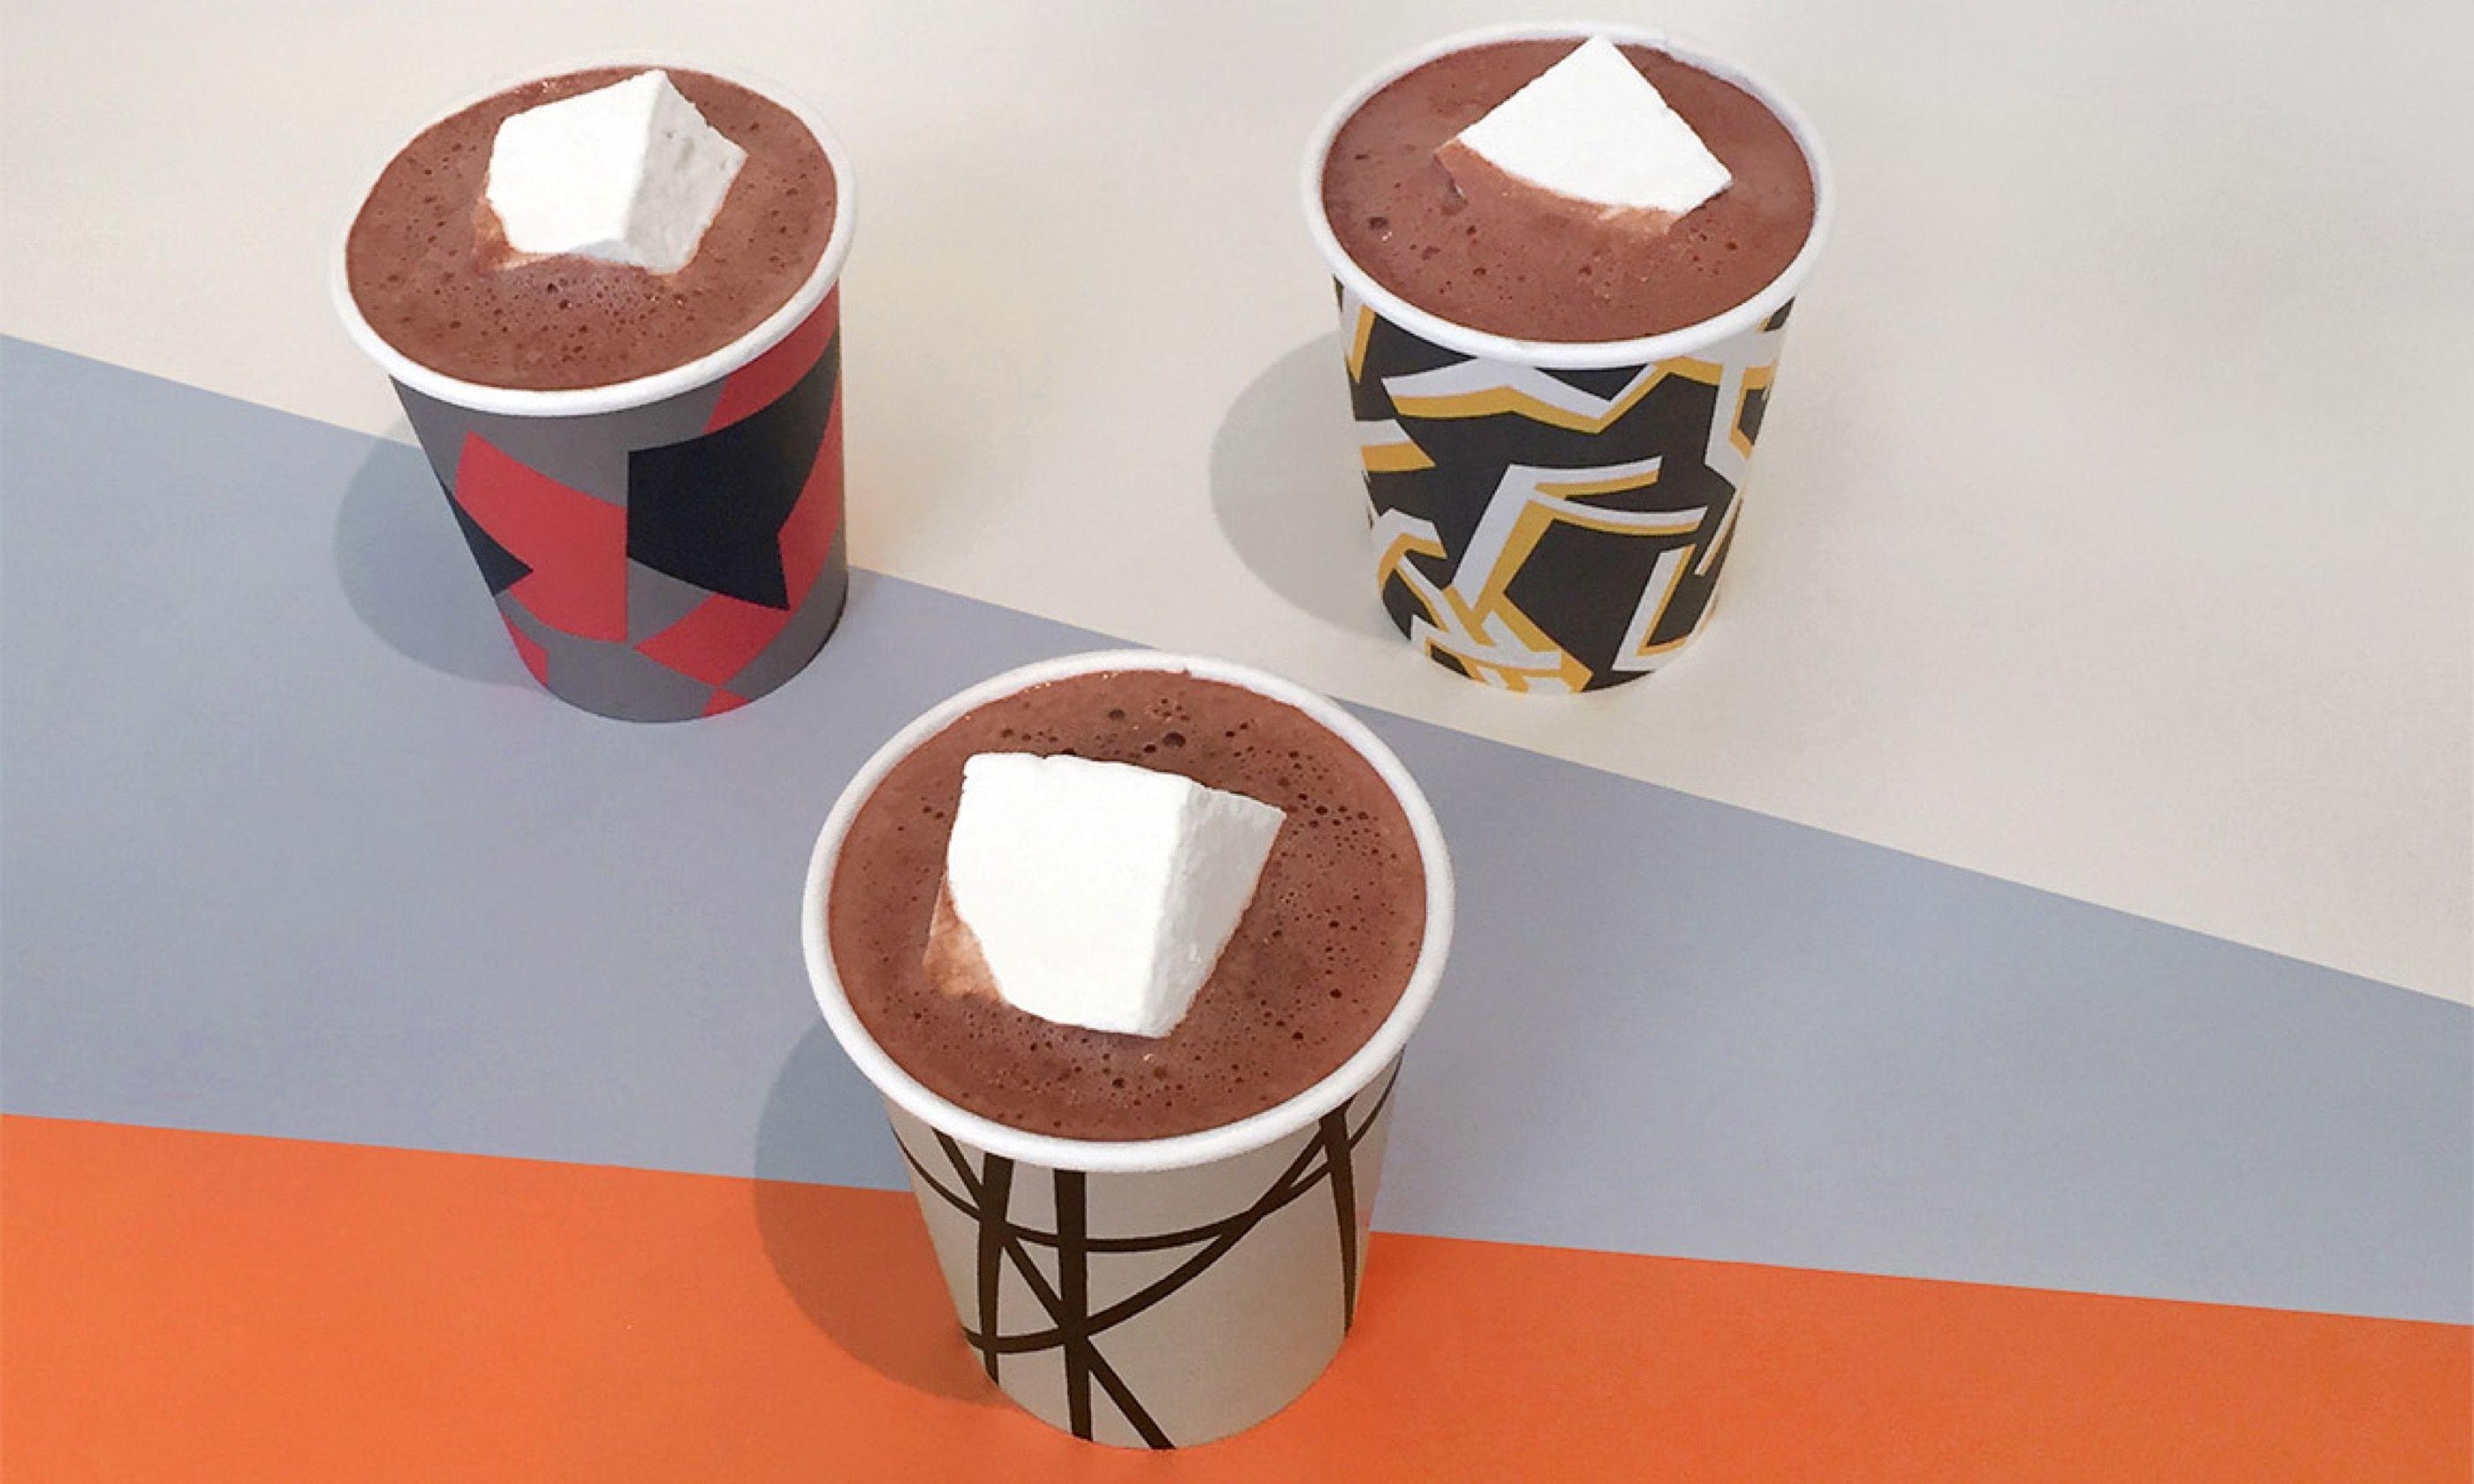 Hot chocolate (mastbrothers.com)